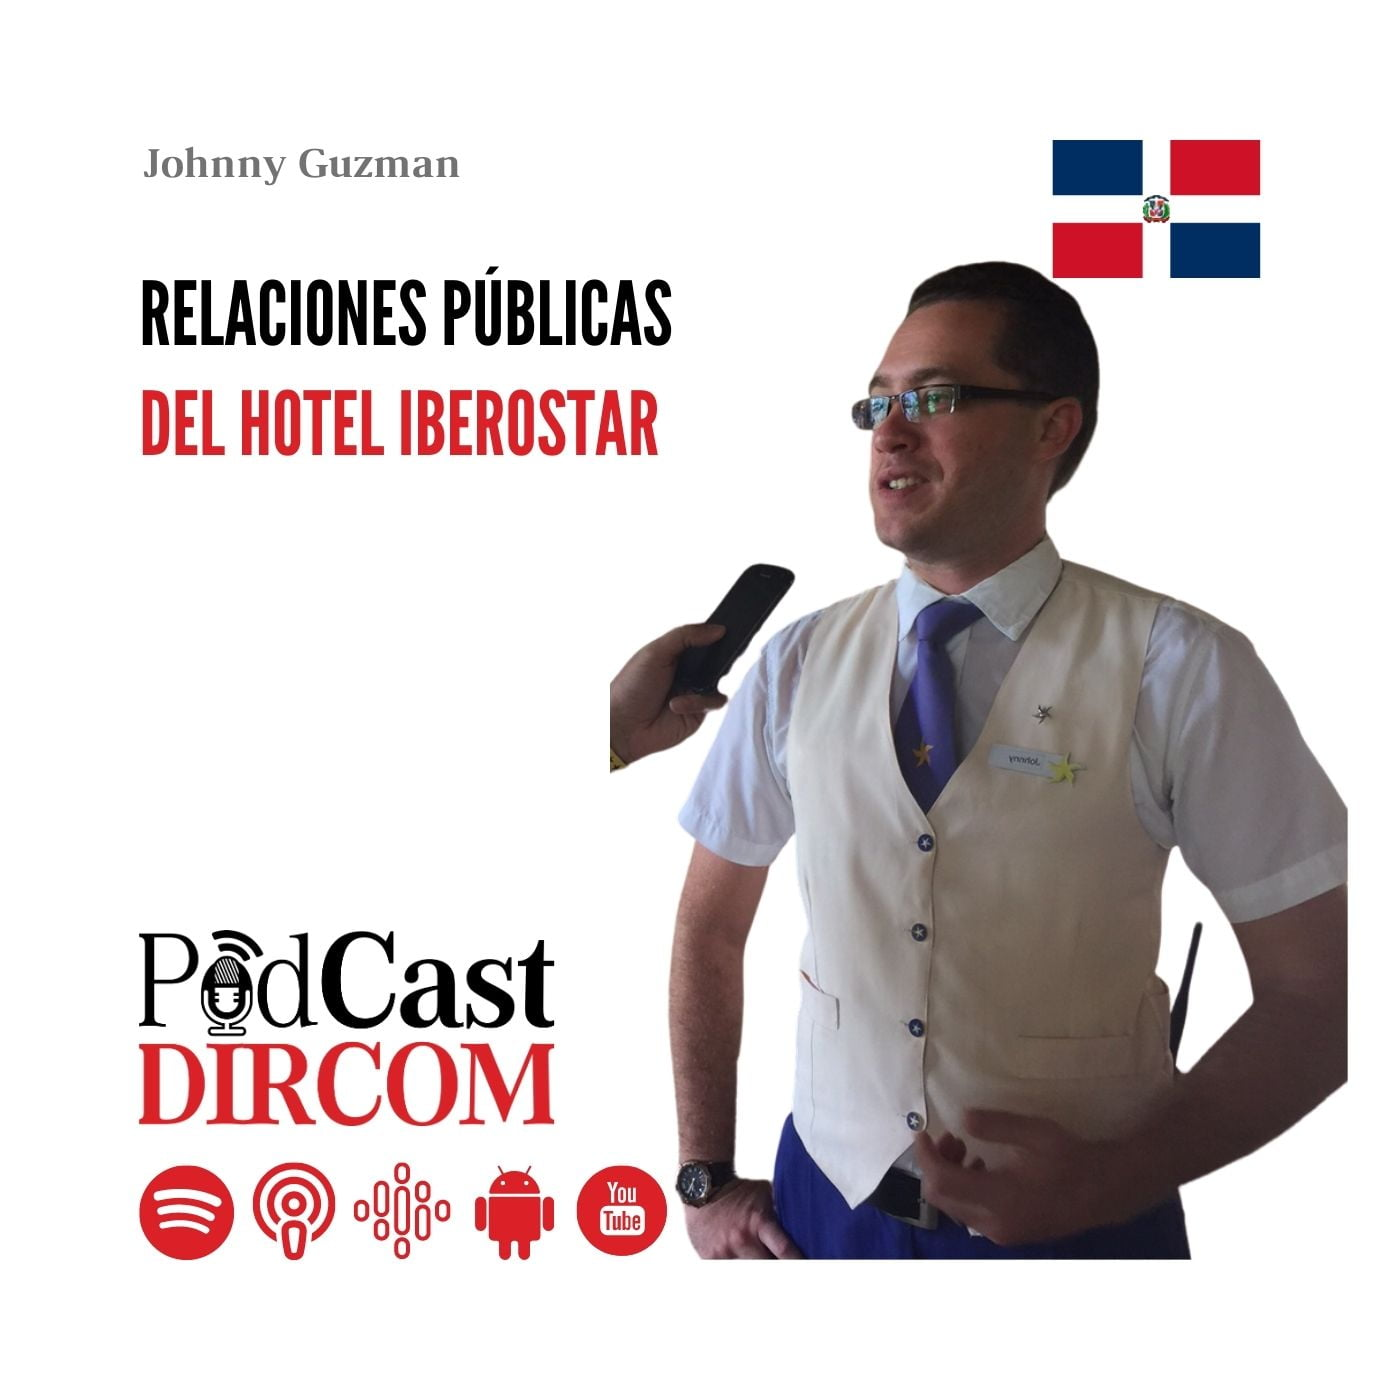 Relaciones Públicas del Hotel Iberostar